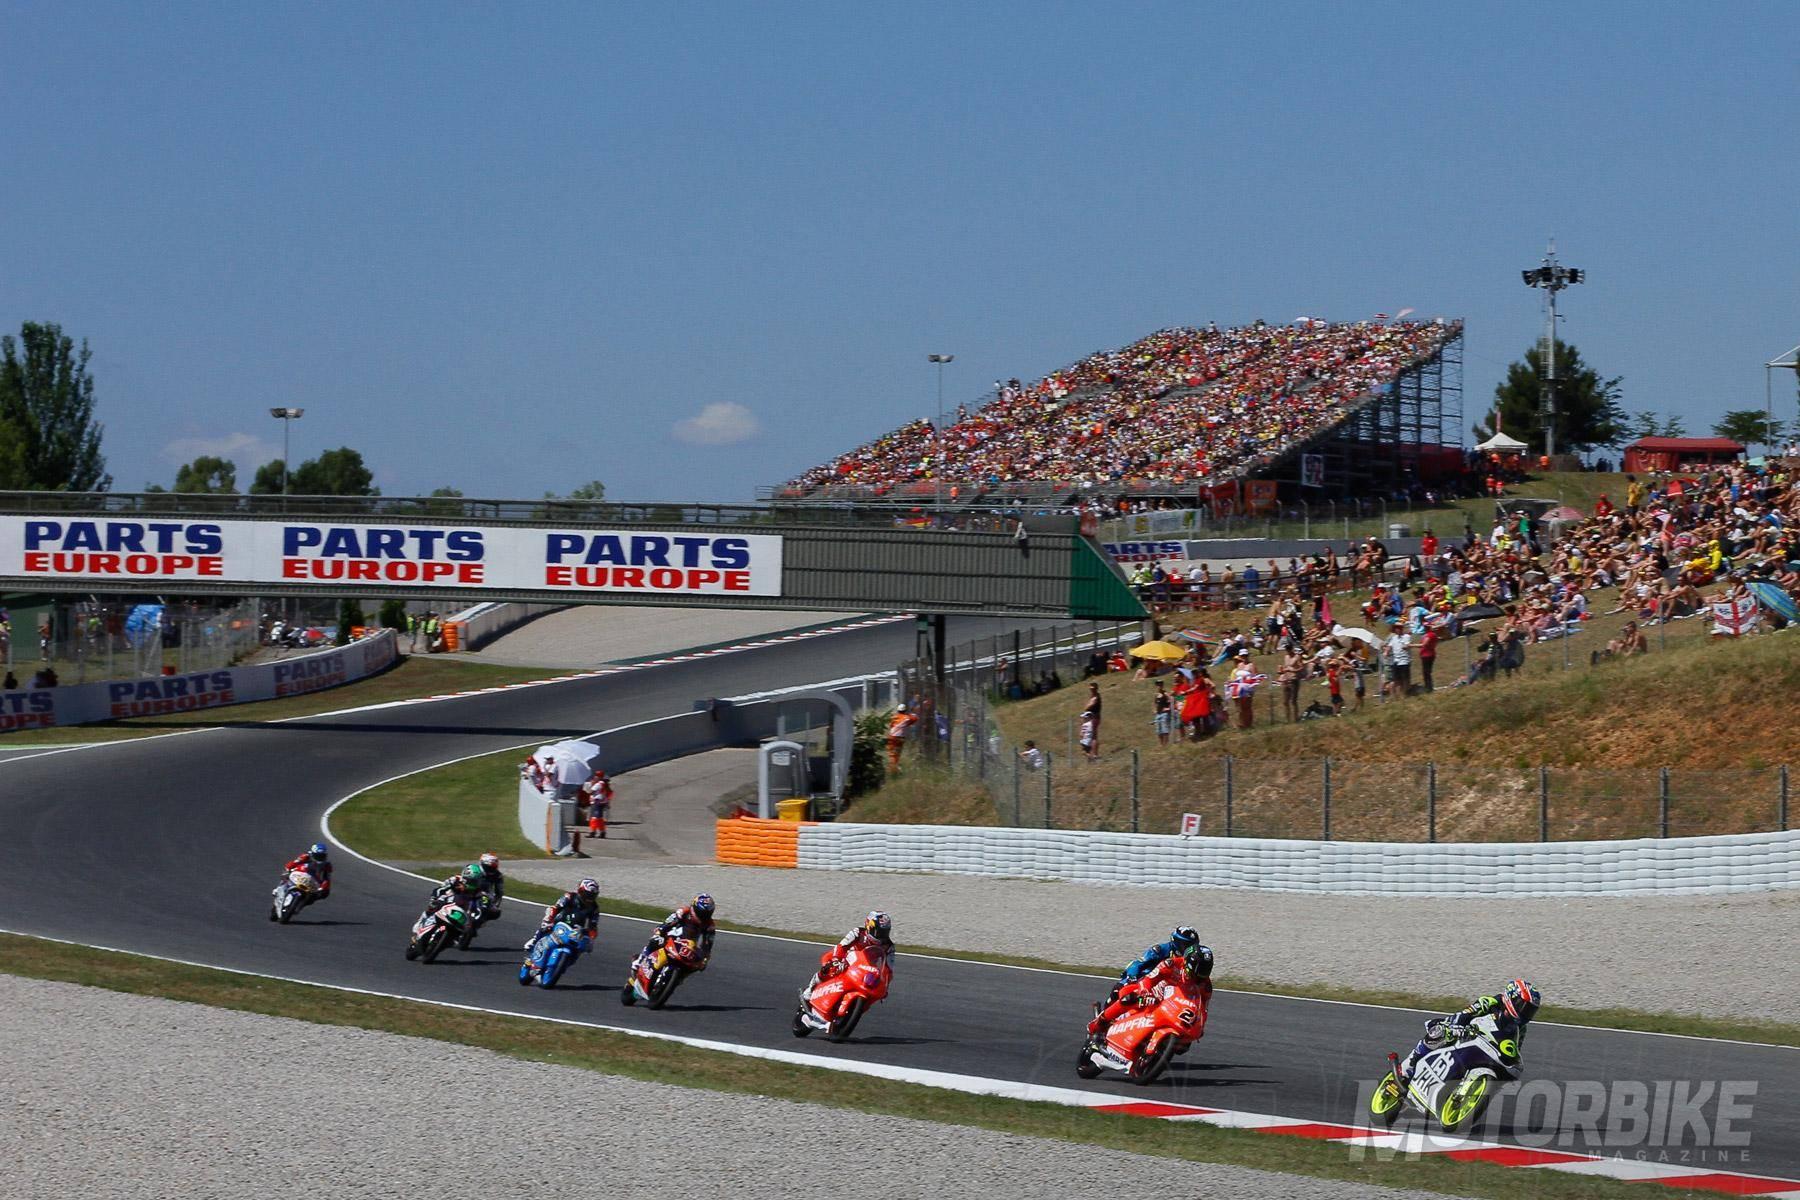 Moto3 Cataluña 2015 - Motorbike Magazine